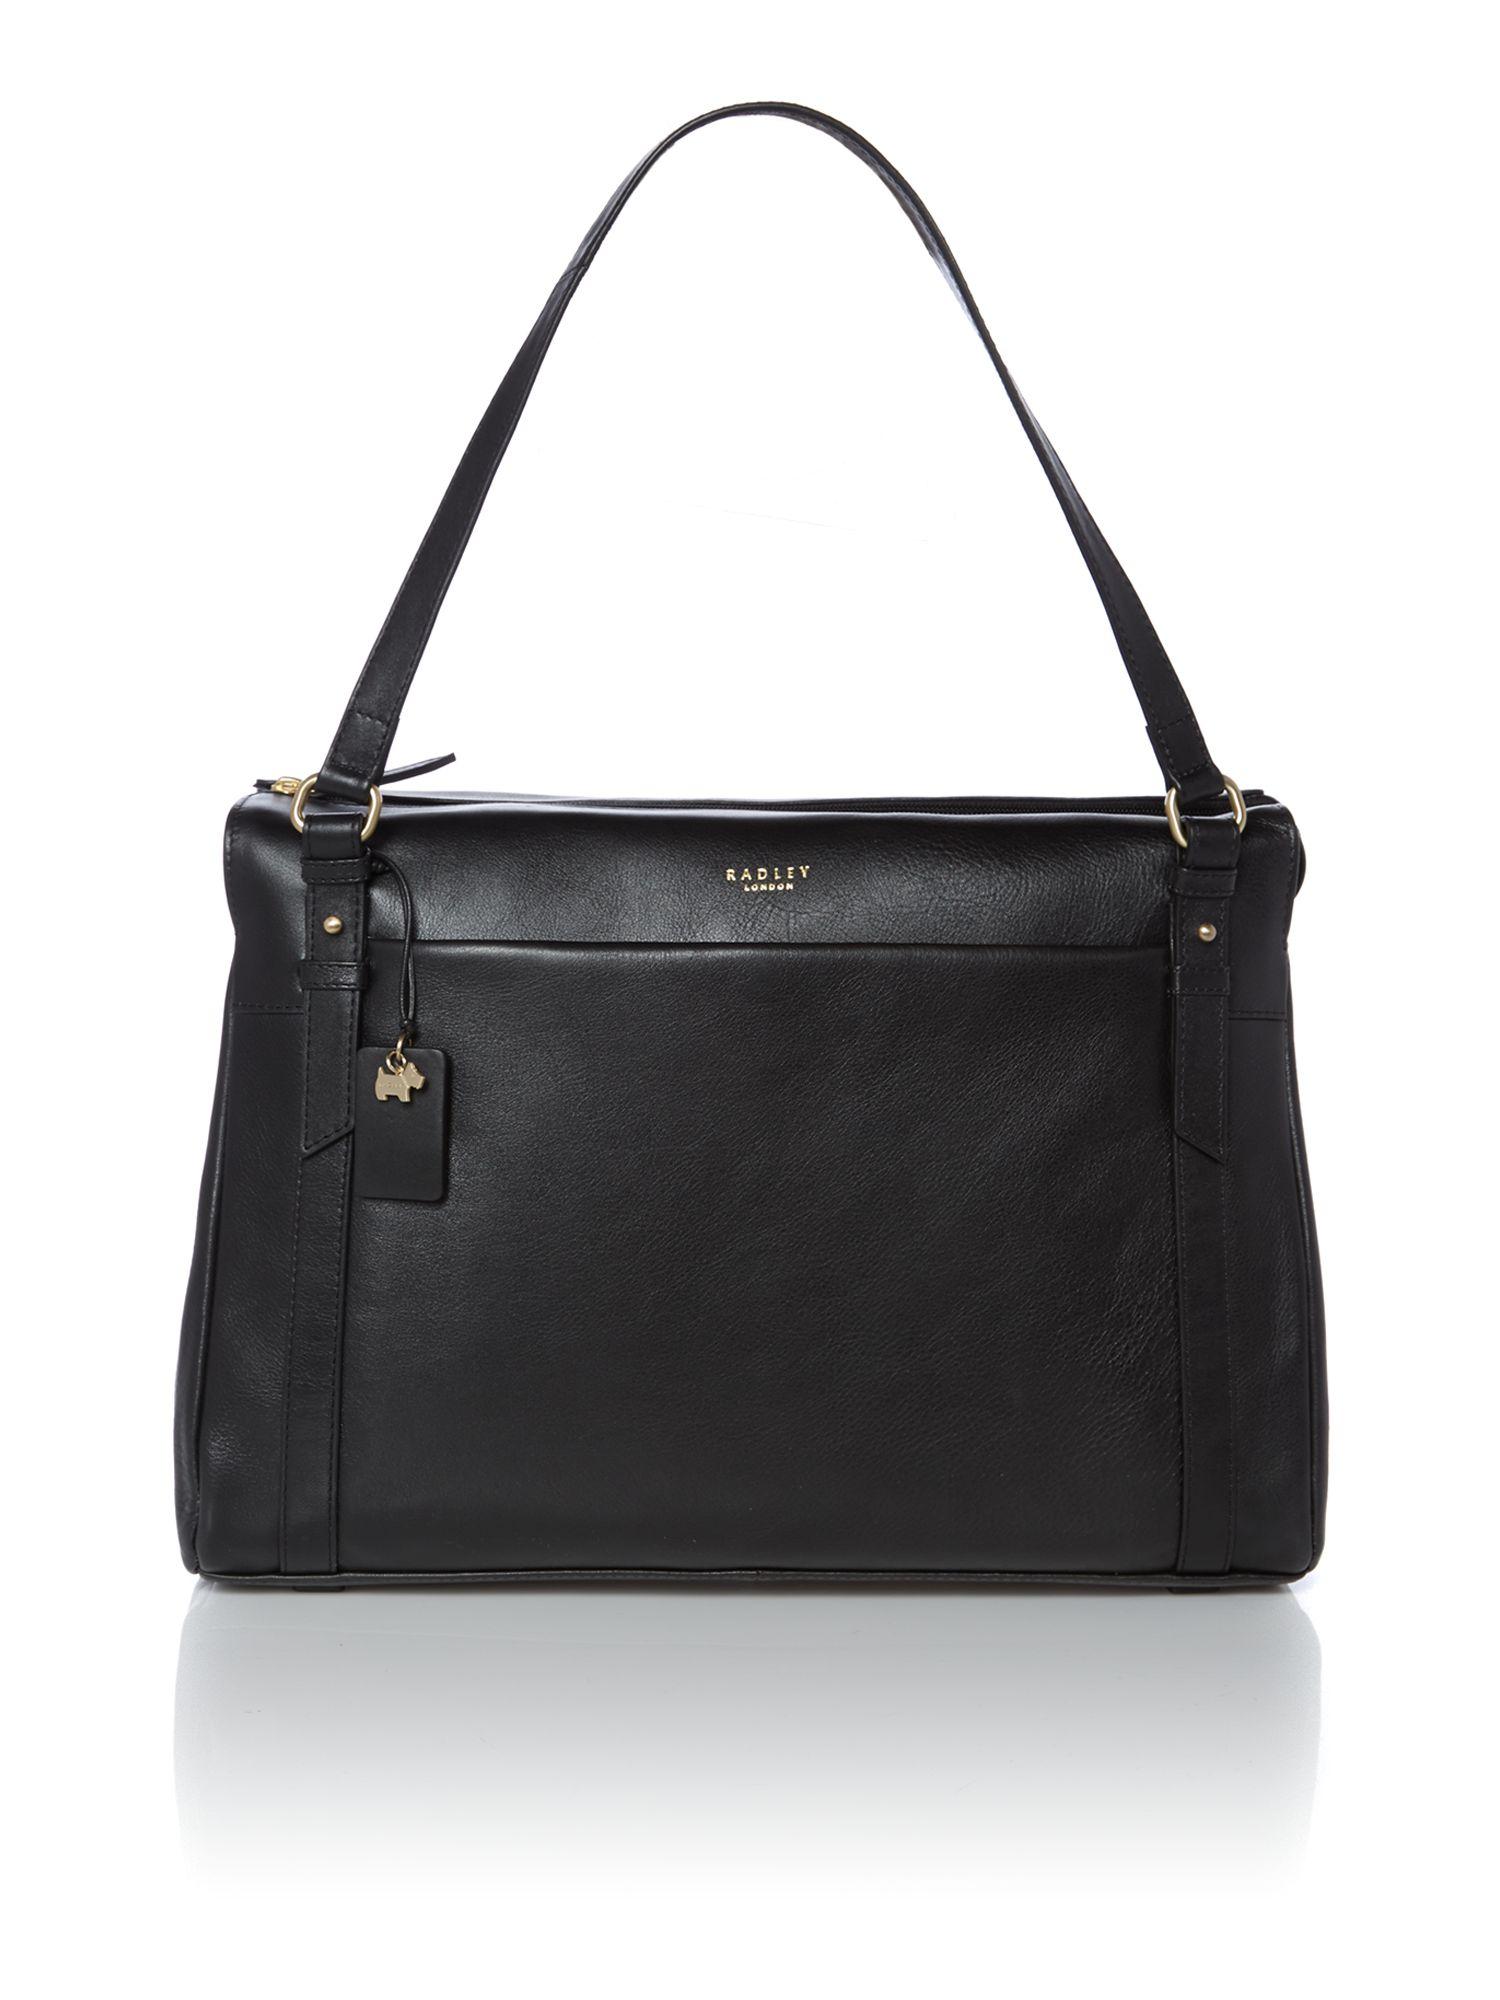 Radley Chelsea Black Large Tote Bag